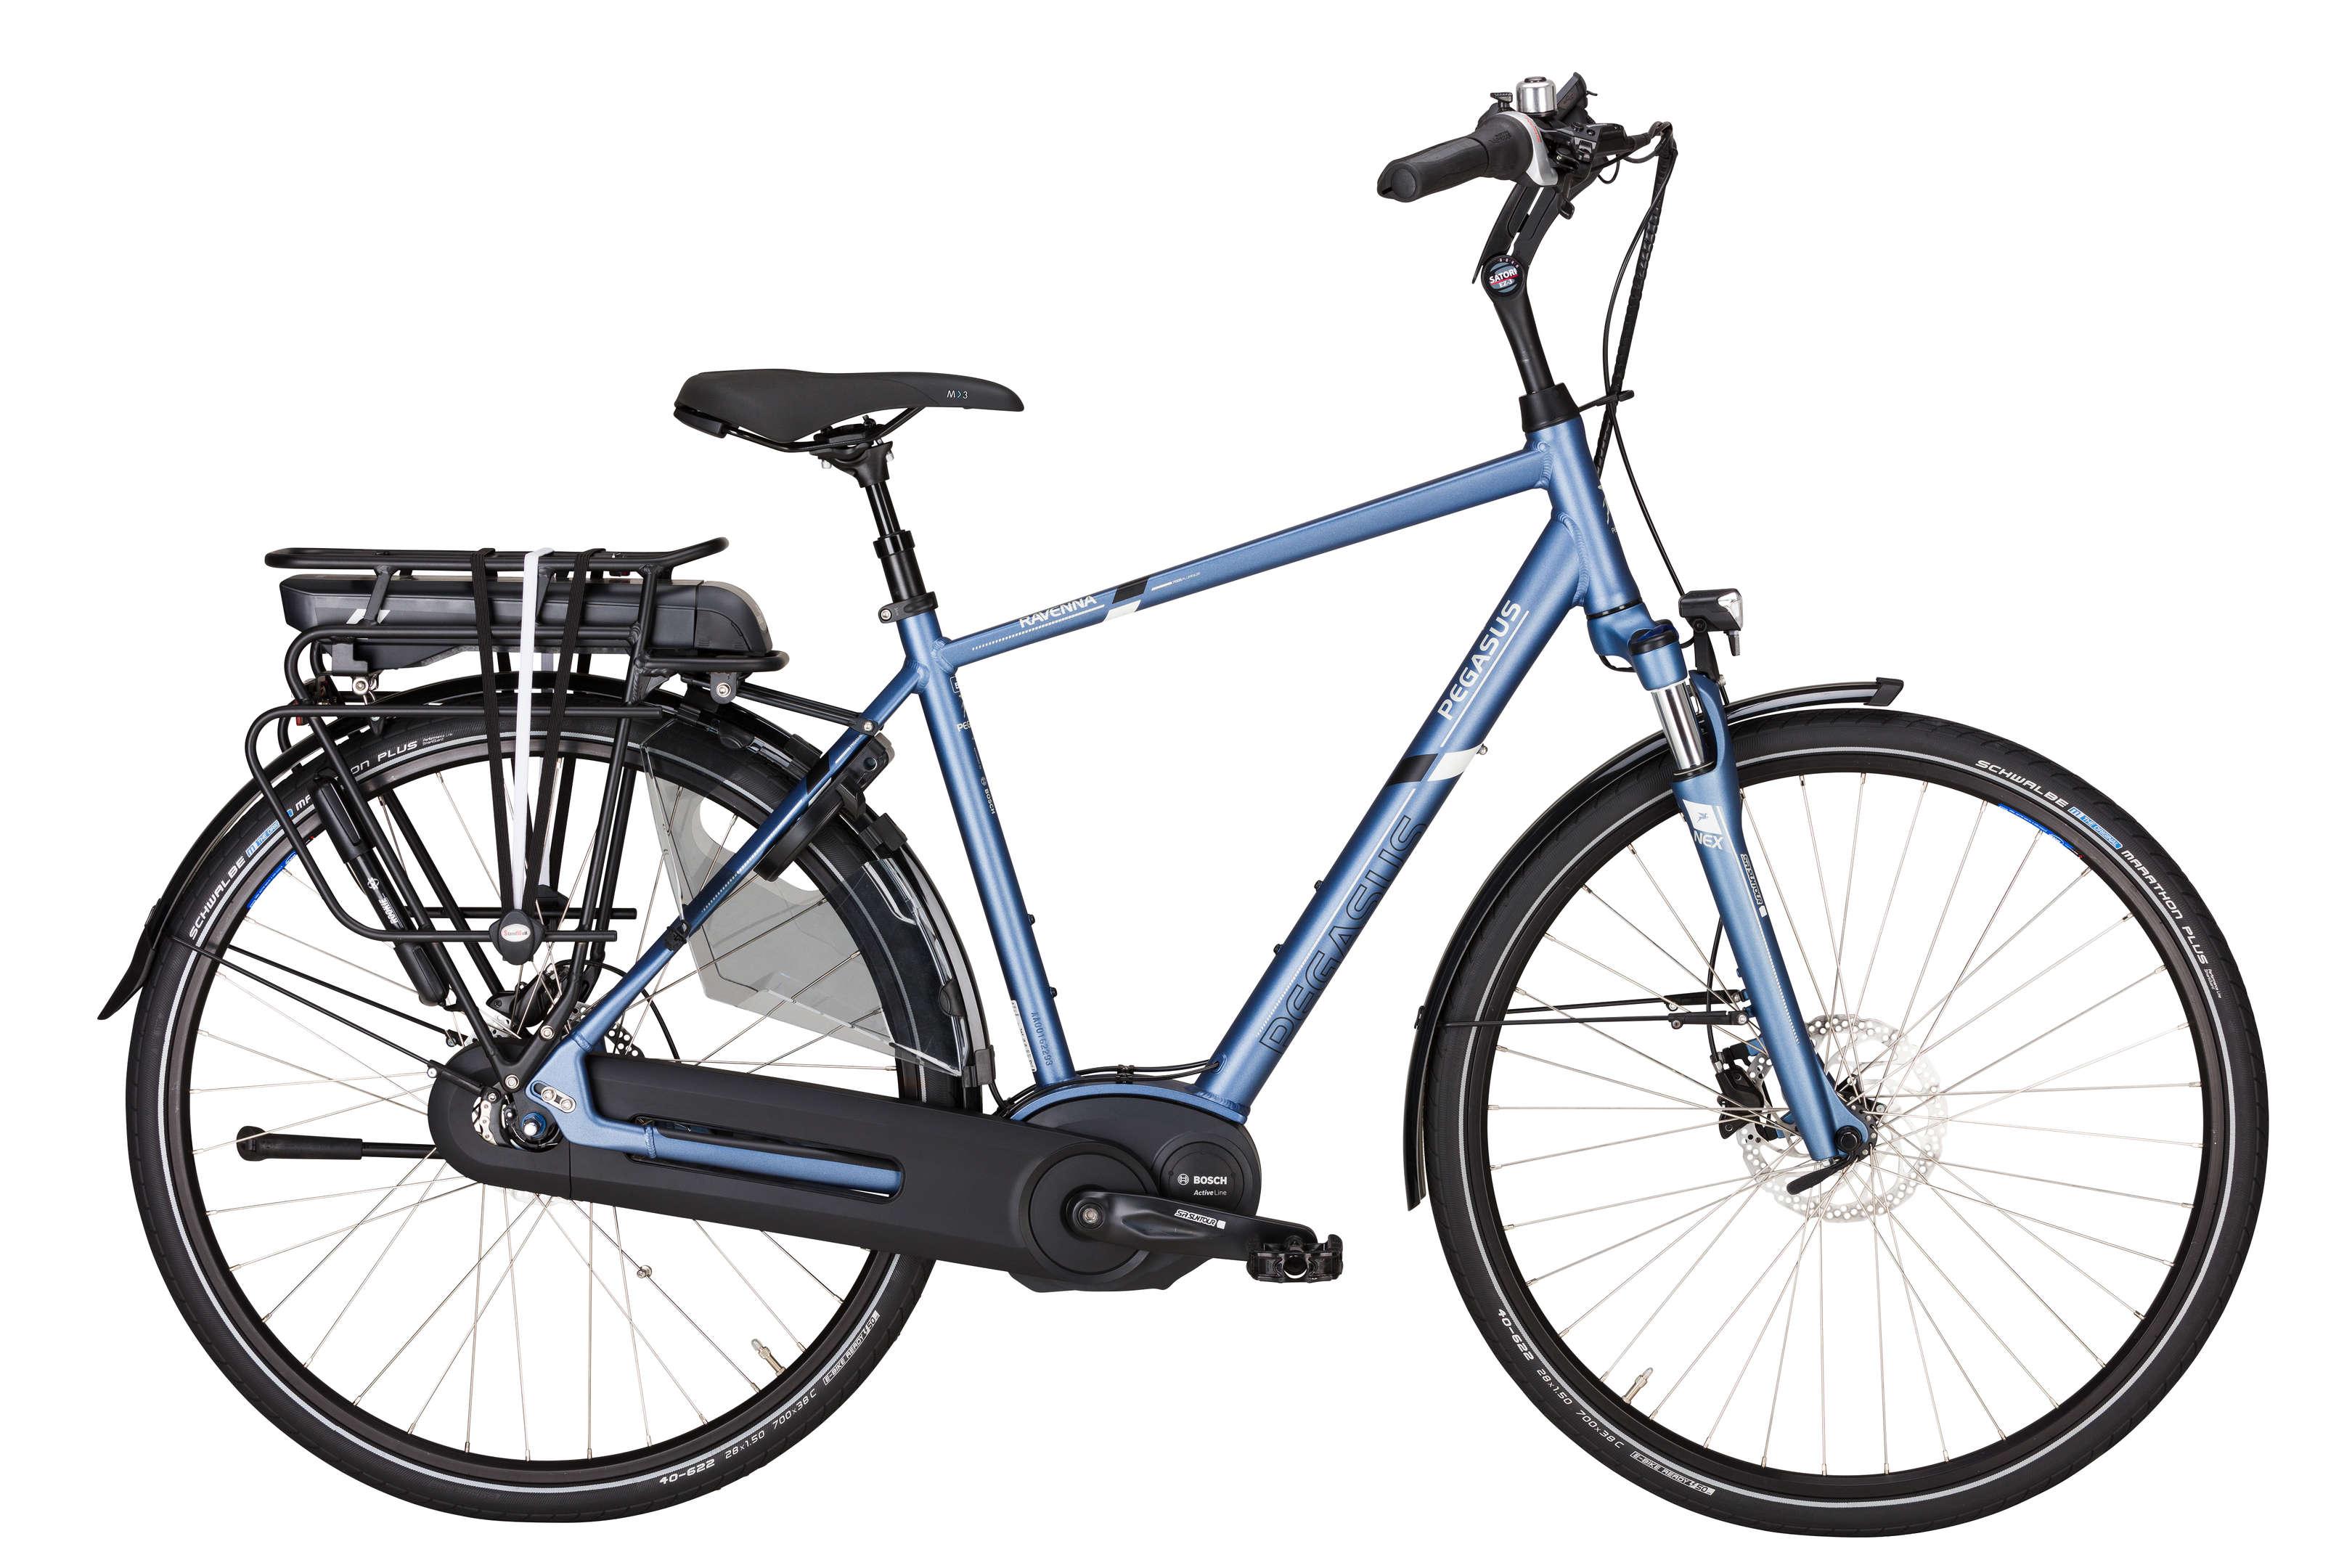 pegasus e bike ravenna 8 eurorad bikeleasingeurorad. Black Bedroom Furniture Sets. Home Design Ideas